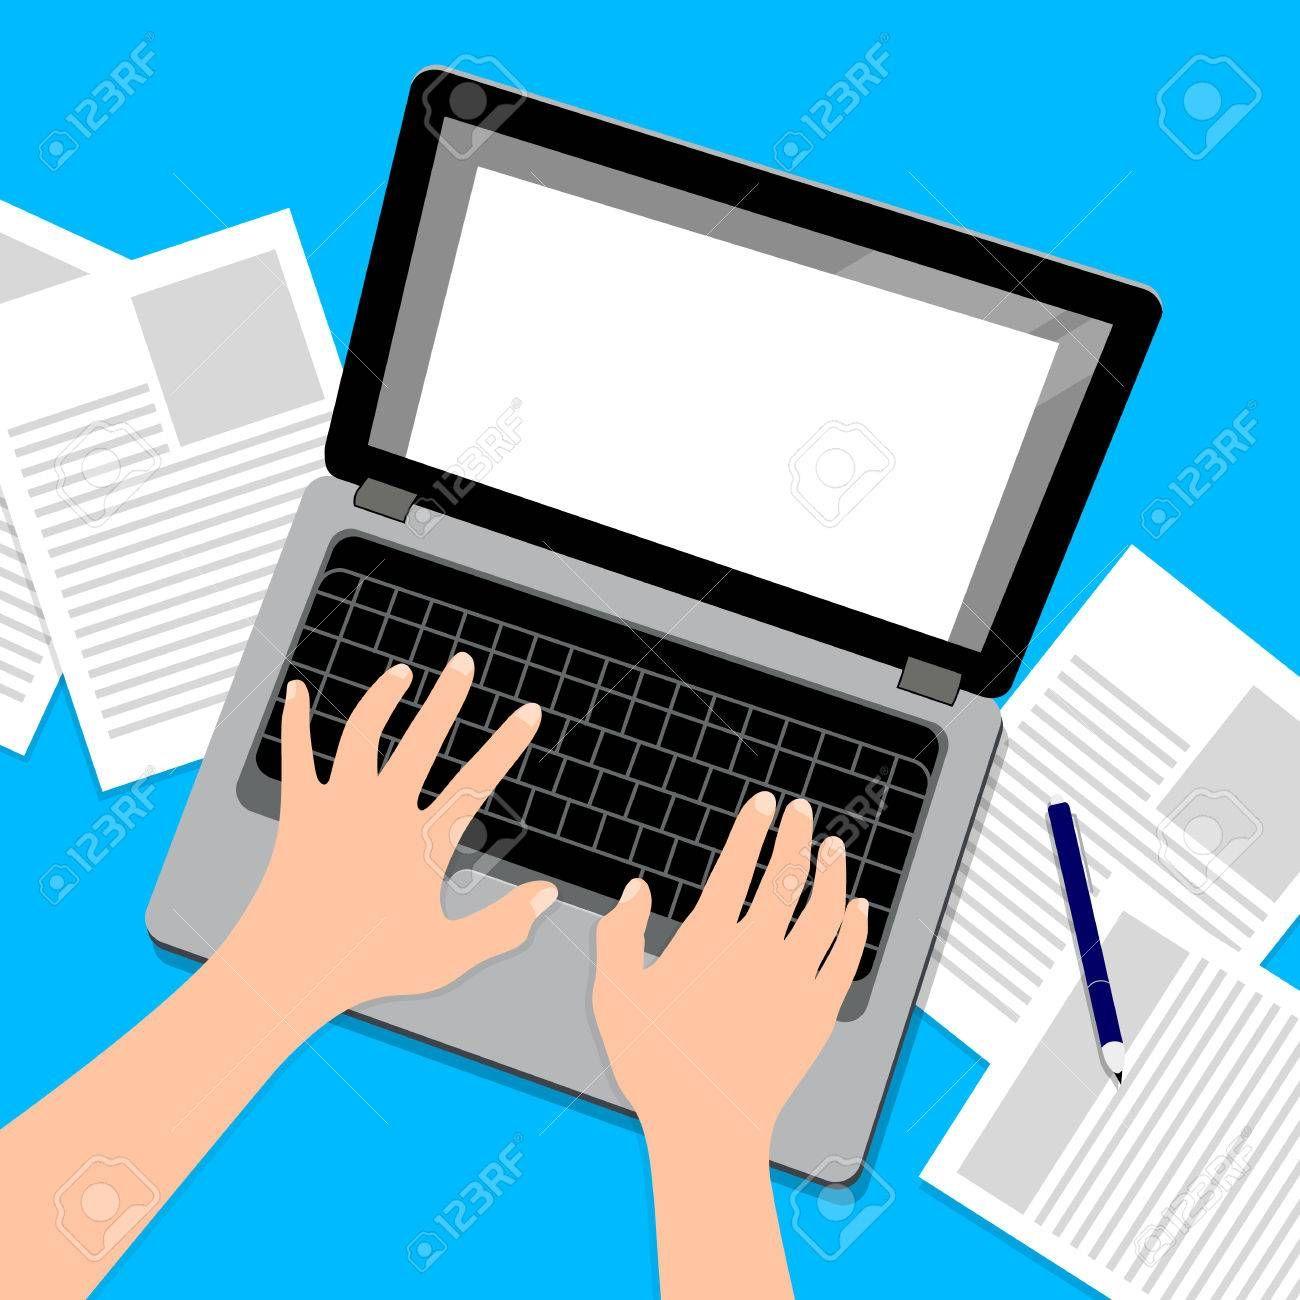 Online Typing Job Legal Typing Jobs Online Typing Jobs Online Jobs